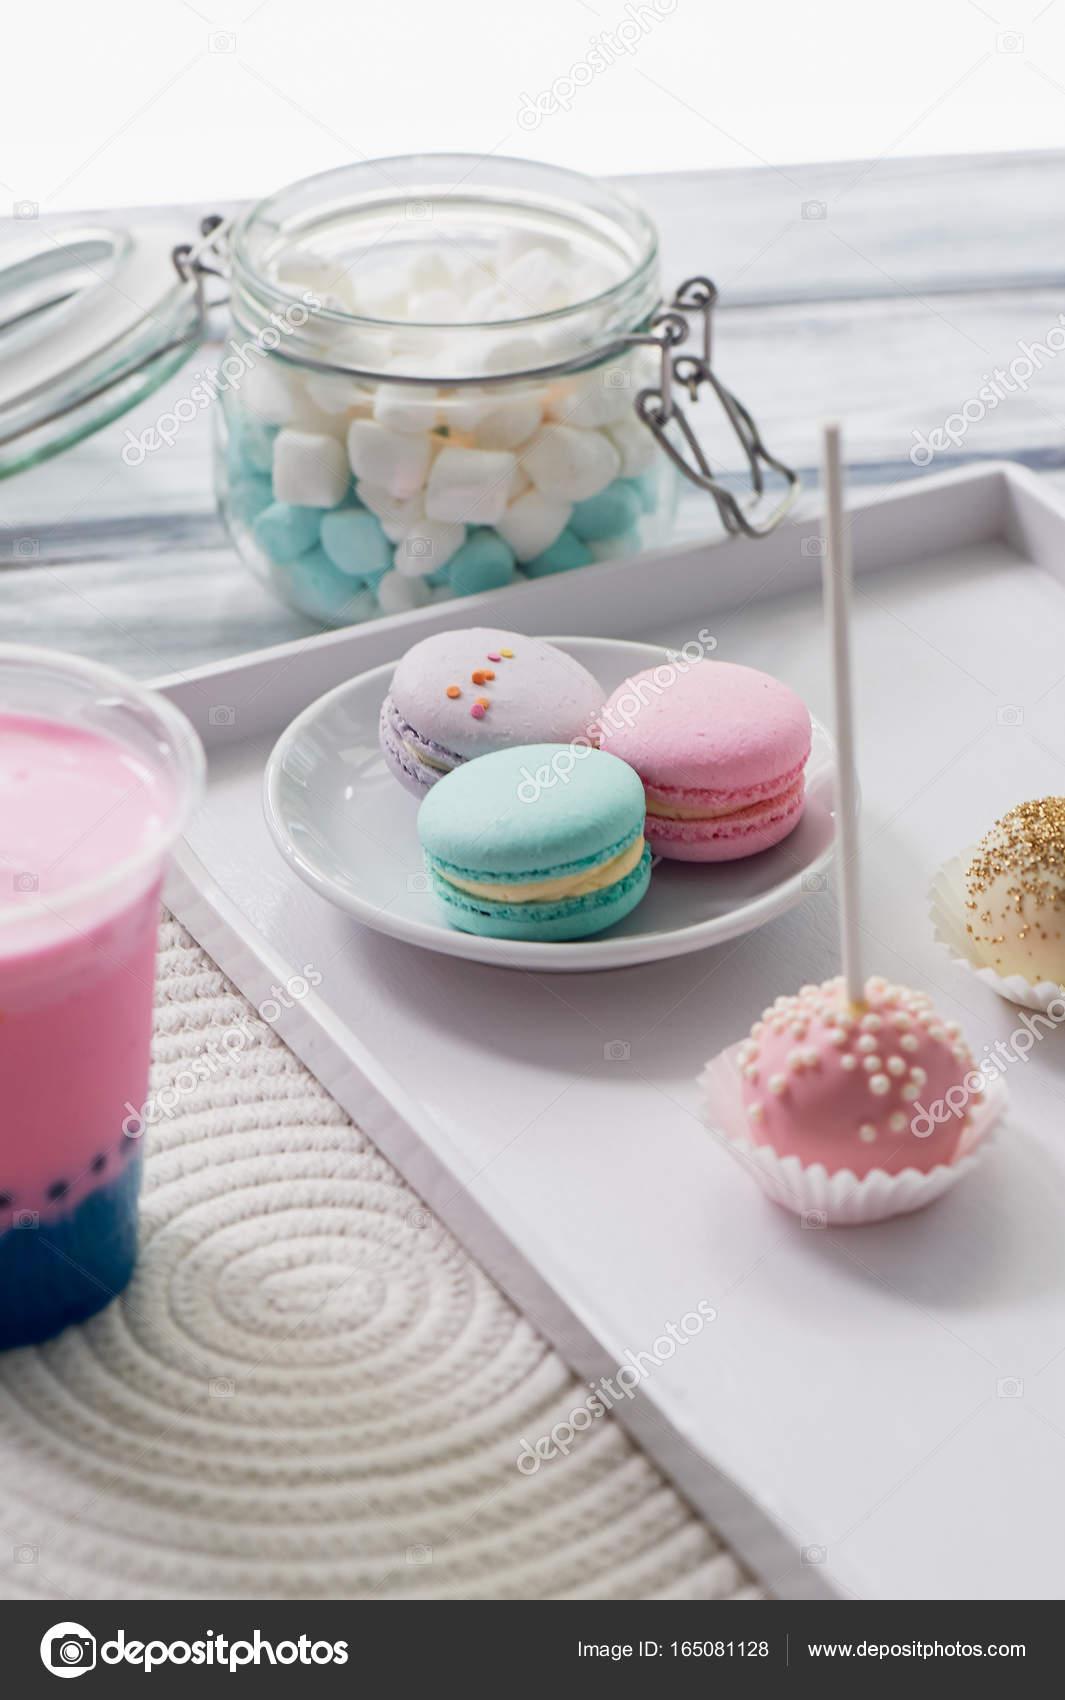 Pastel Vintage Aesthetic Beautiful Sweets Pastel Shades On